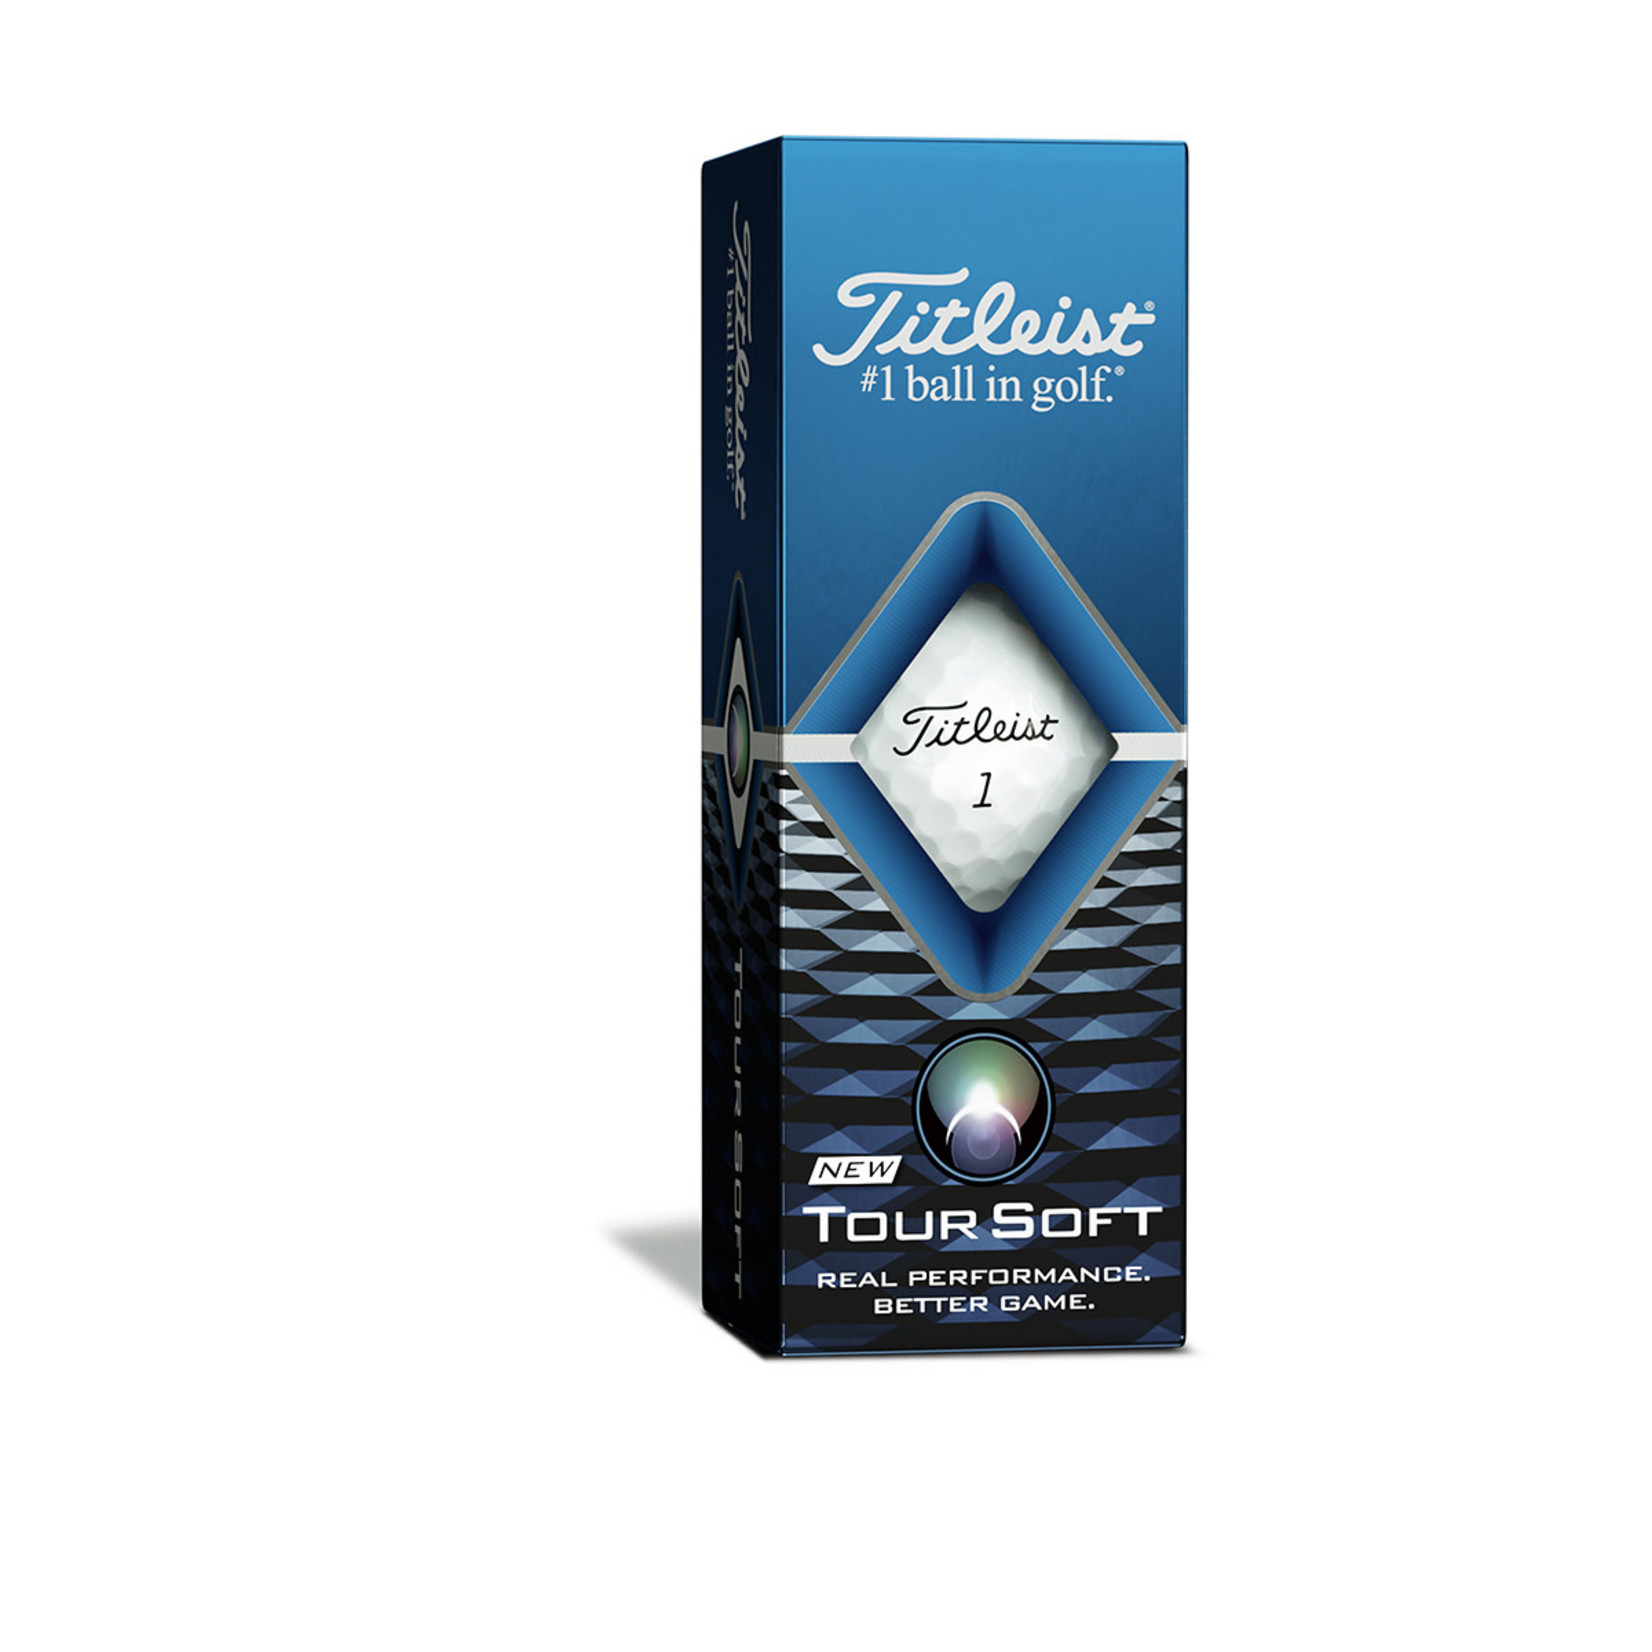 Titleist Titleist Tour Soft White sleeve (3 balls)